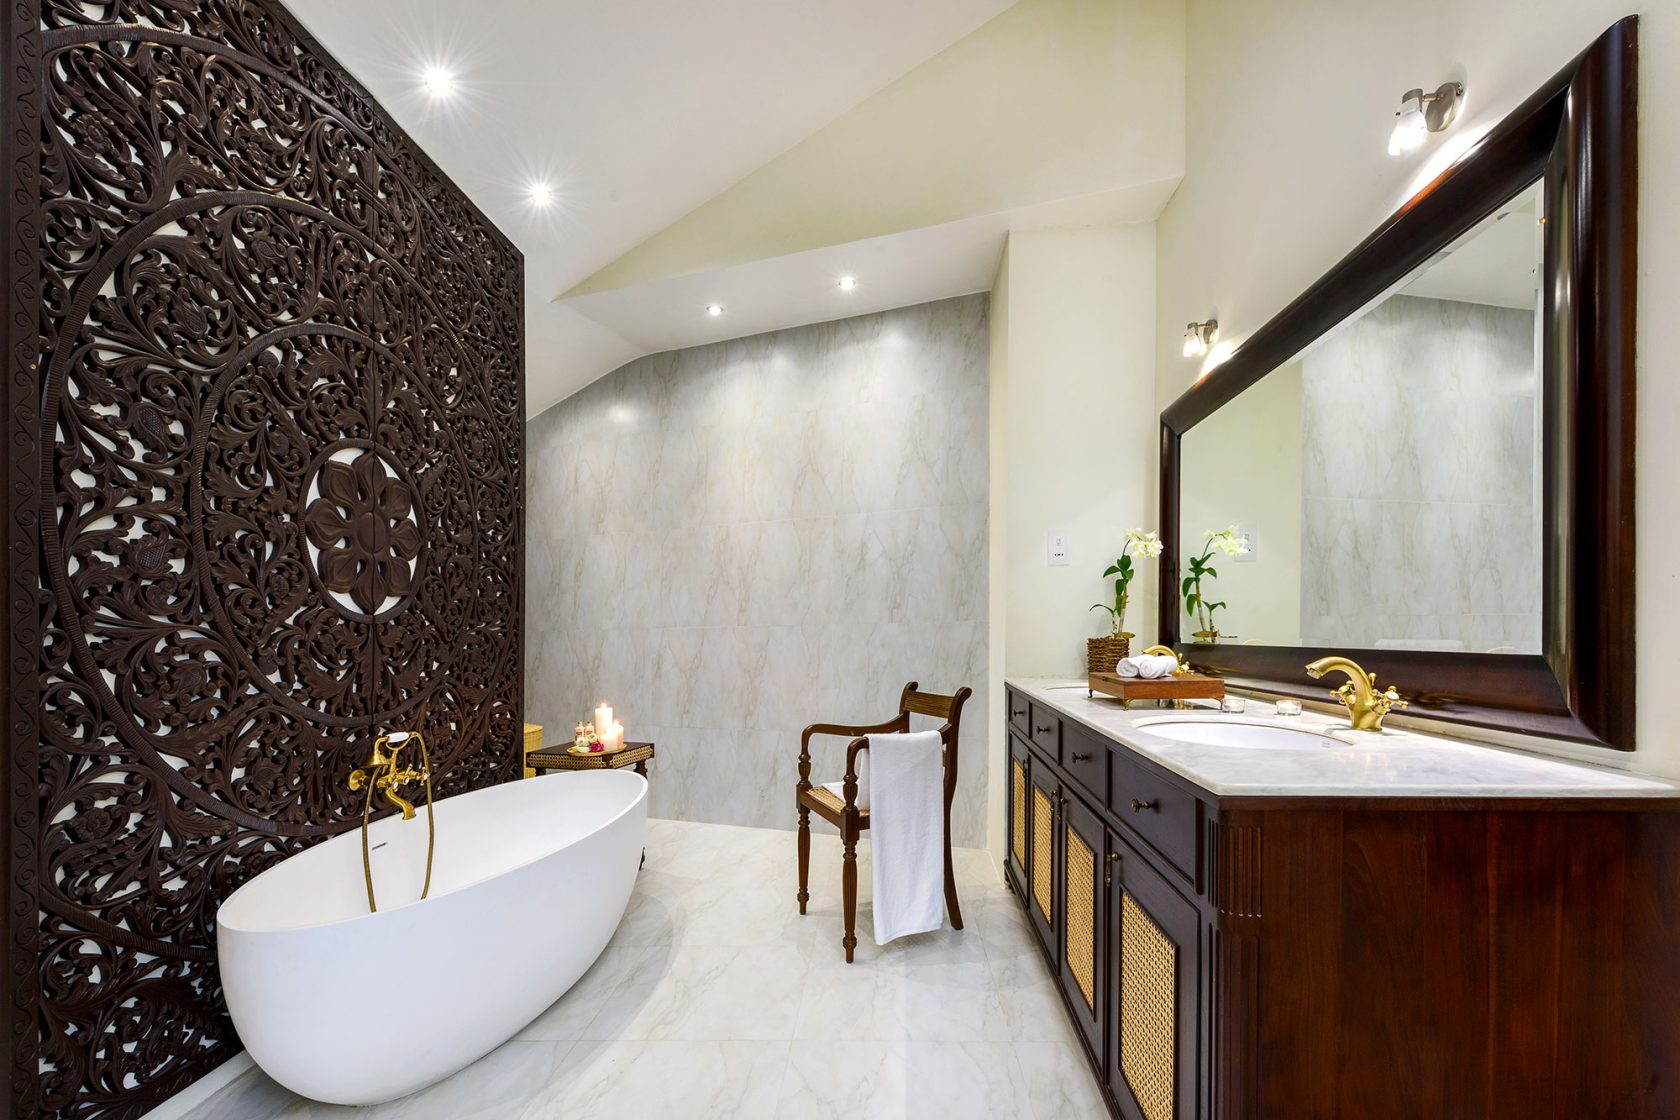 Ulagalla by Uga Escapes Nikawewa Villa Bathroom